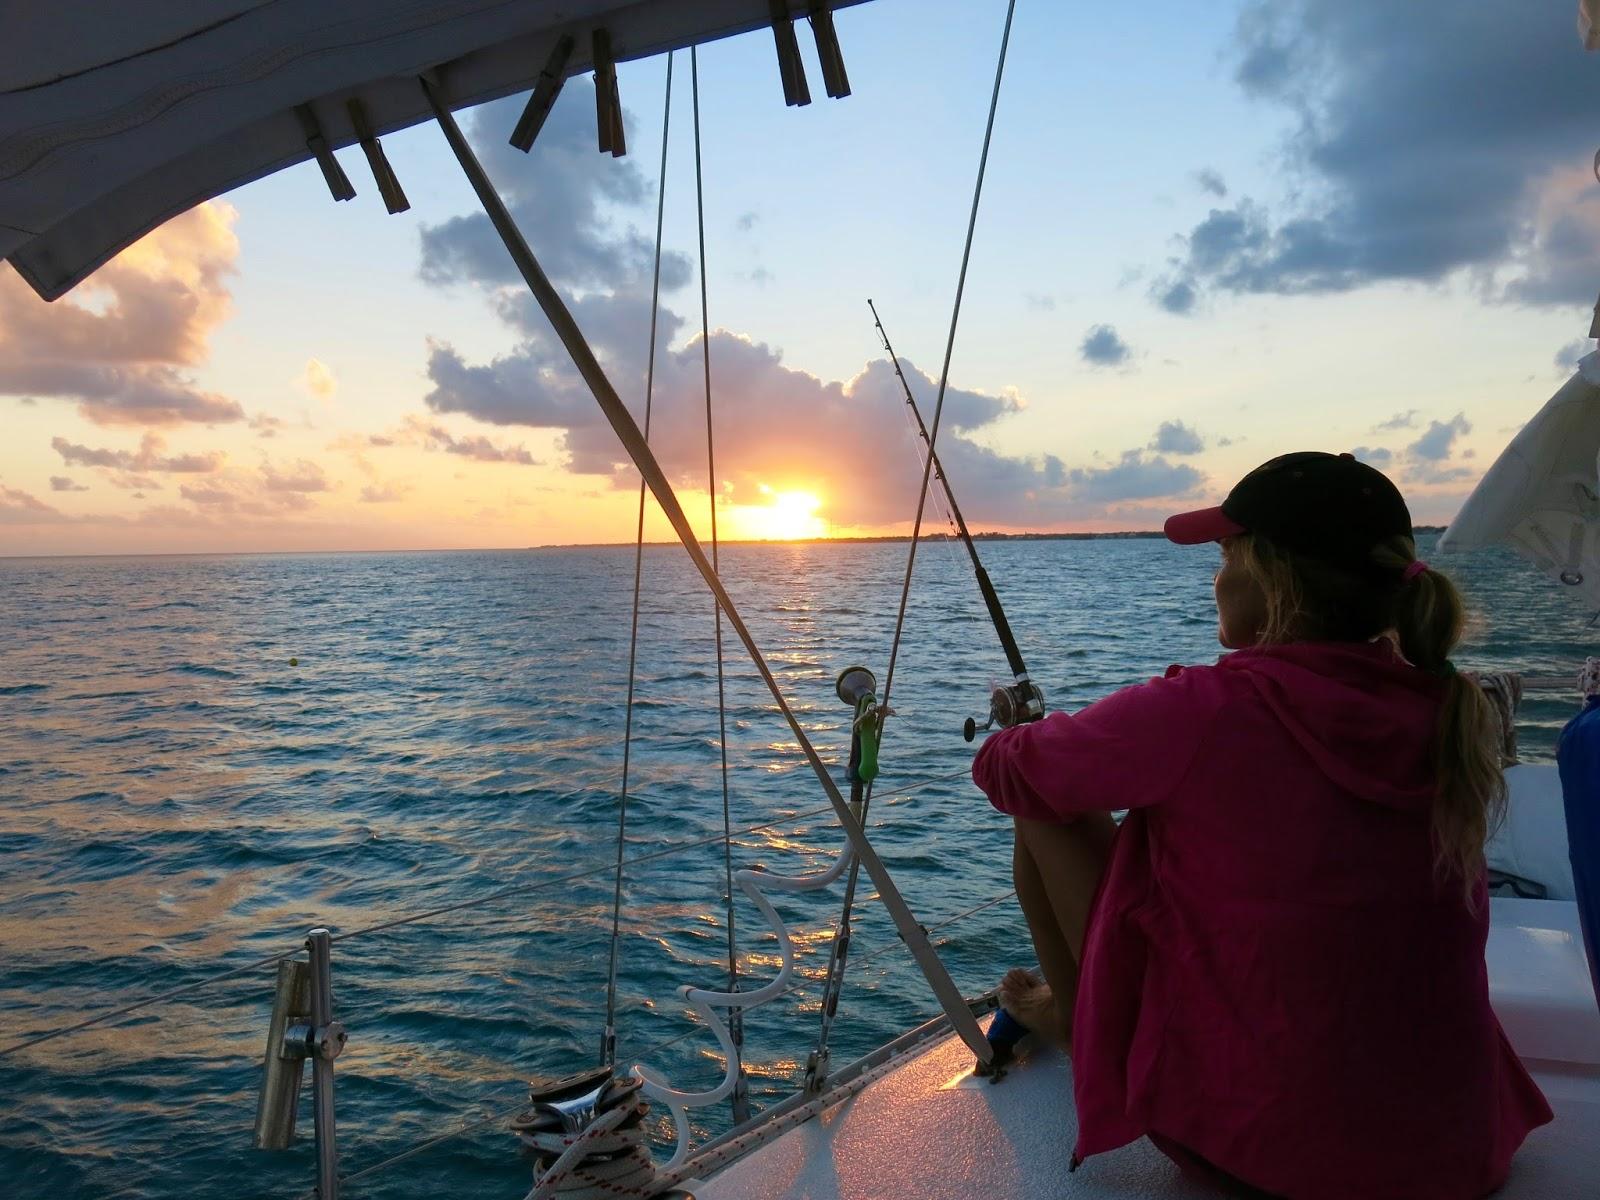 7 Day Live Aboard Asa Sailing Classasa101 104 Bareboat Chartering